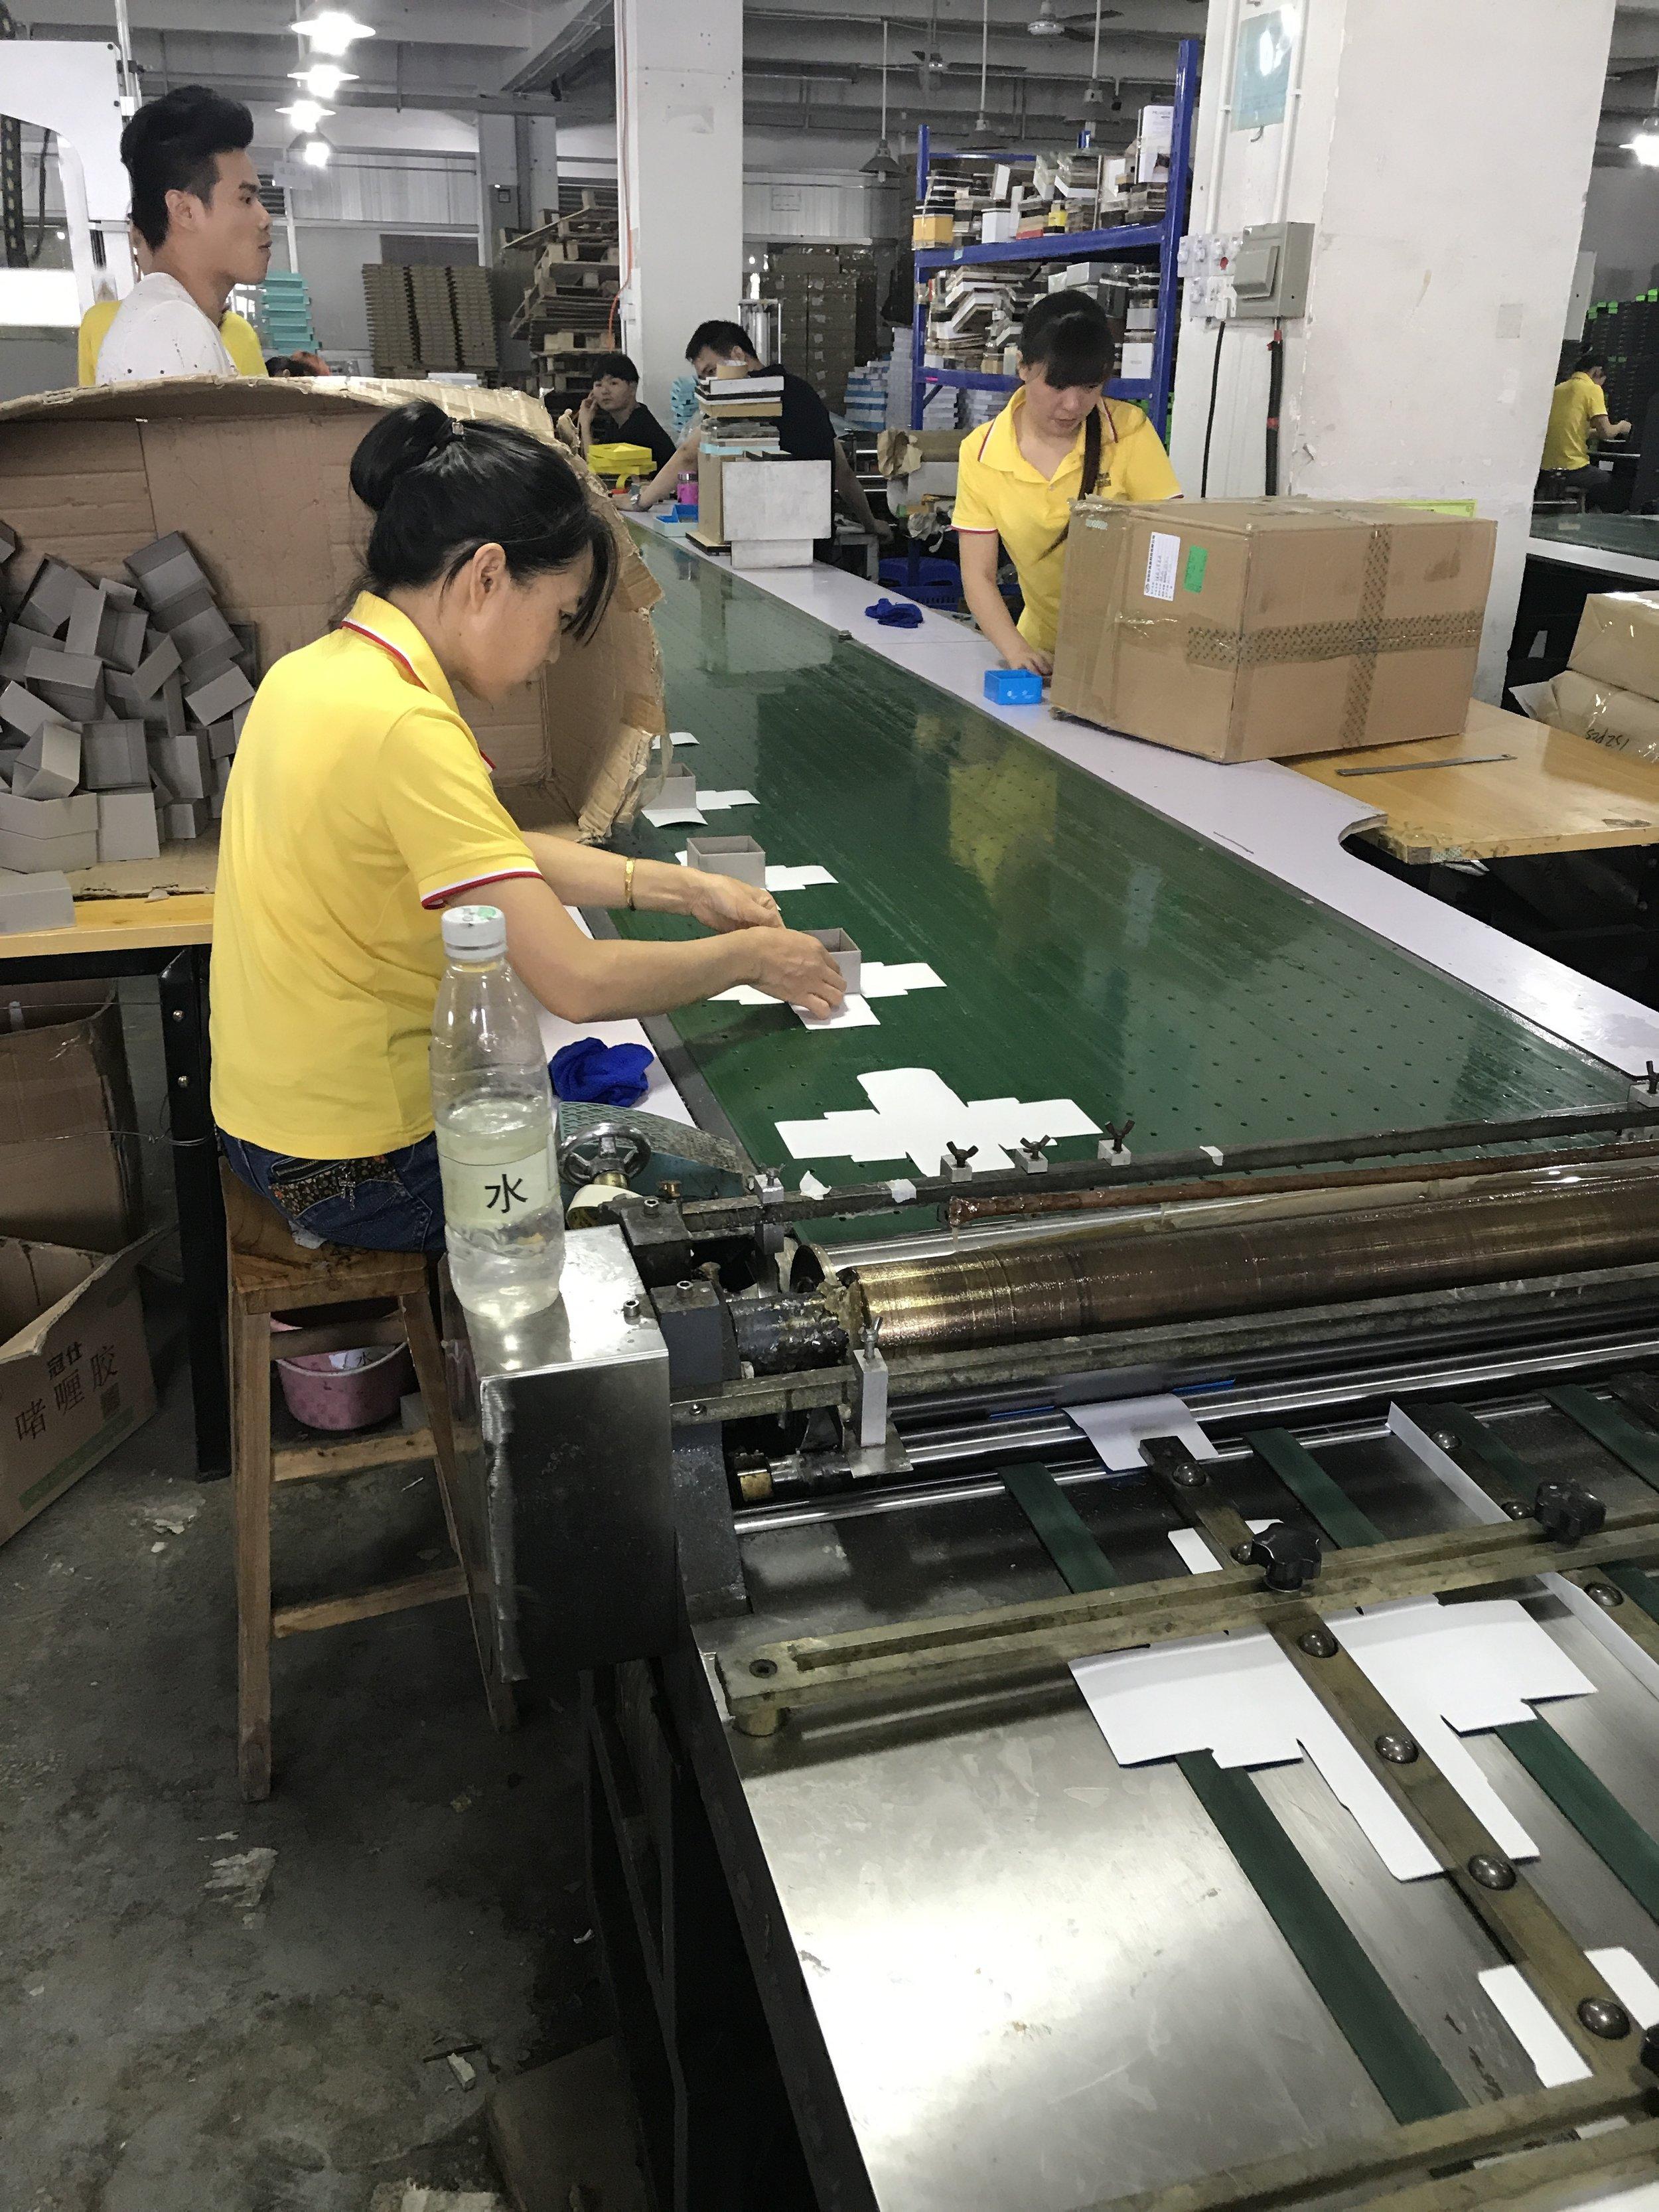 Box assembly line